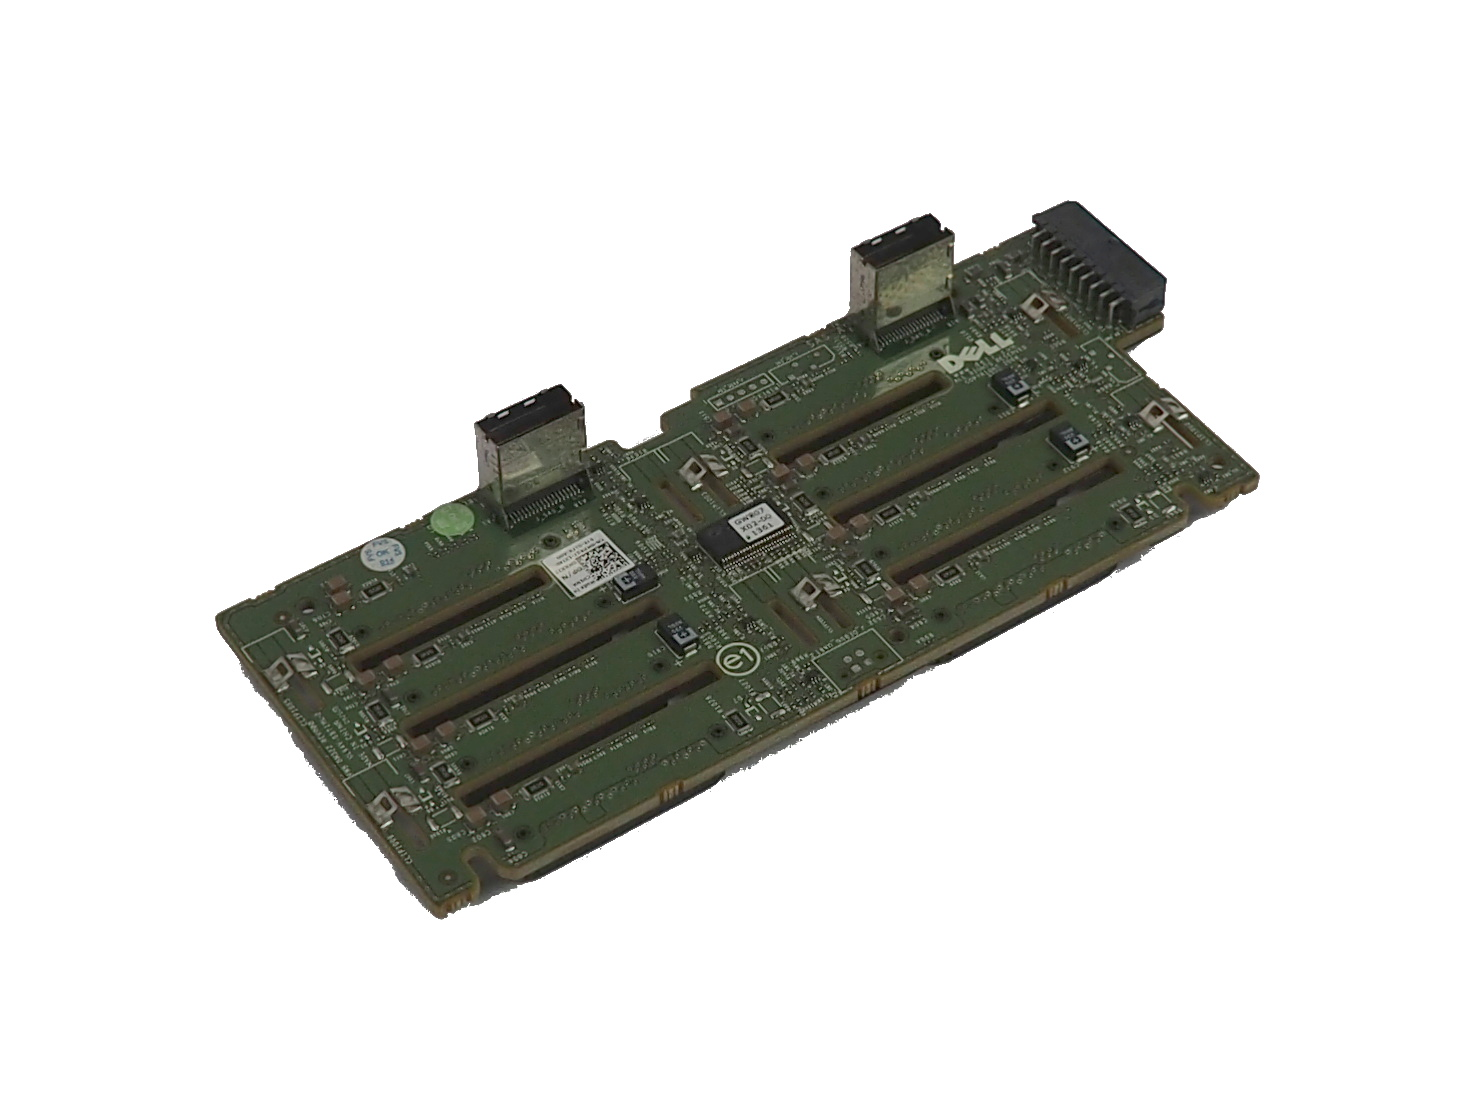 Dell MX827 8 Bay SAS/SATA Hard Drive Backplane For PowerEdge R710 Server